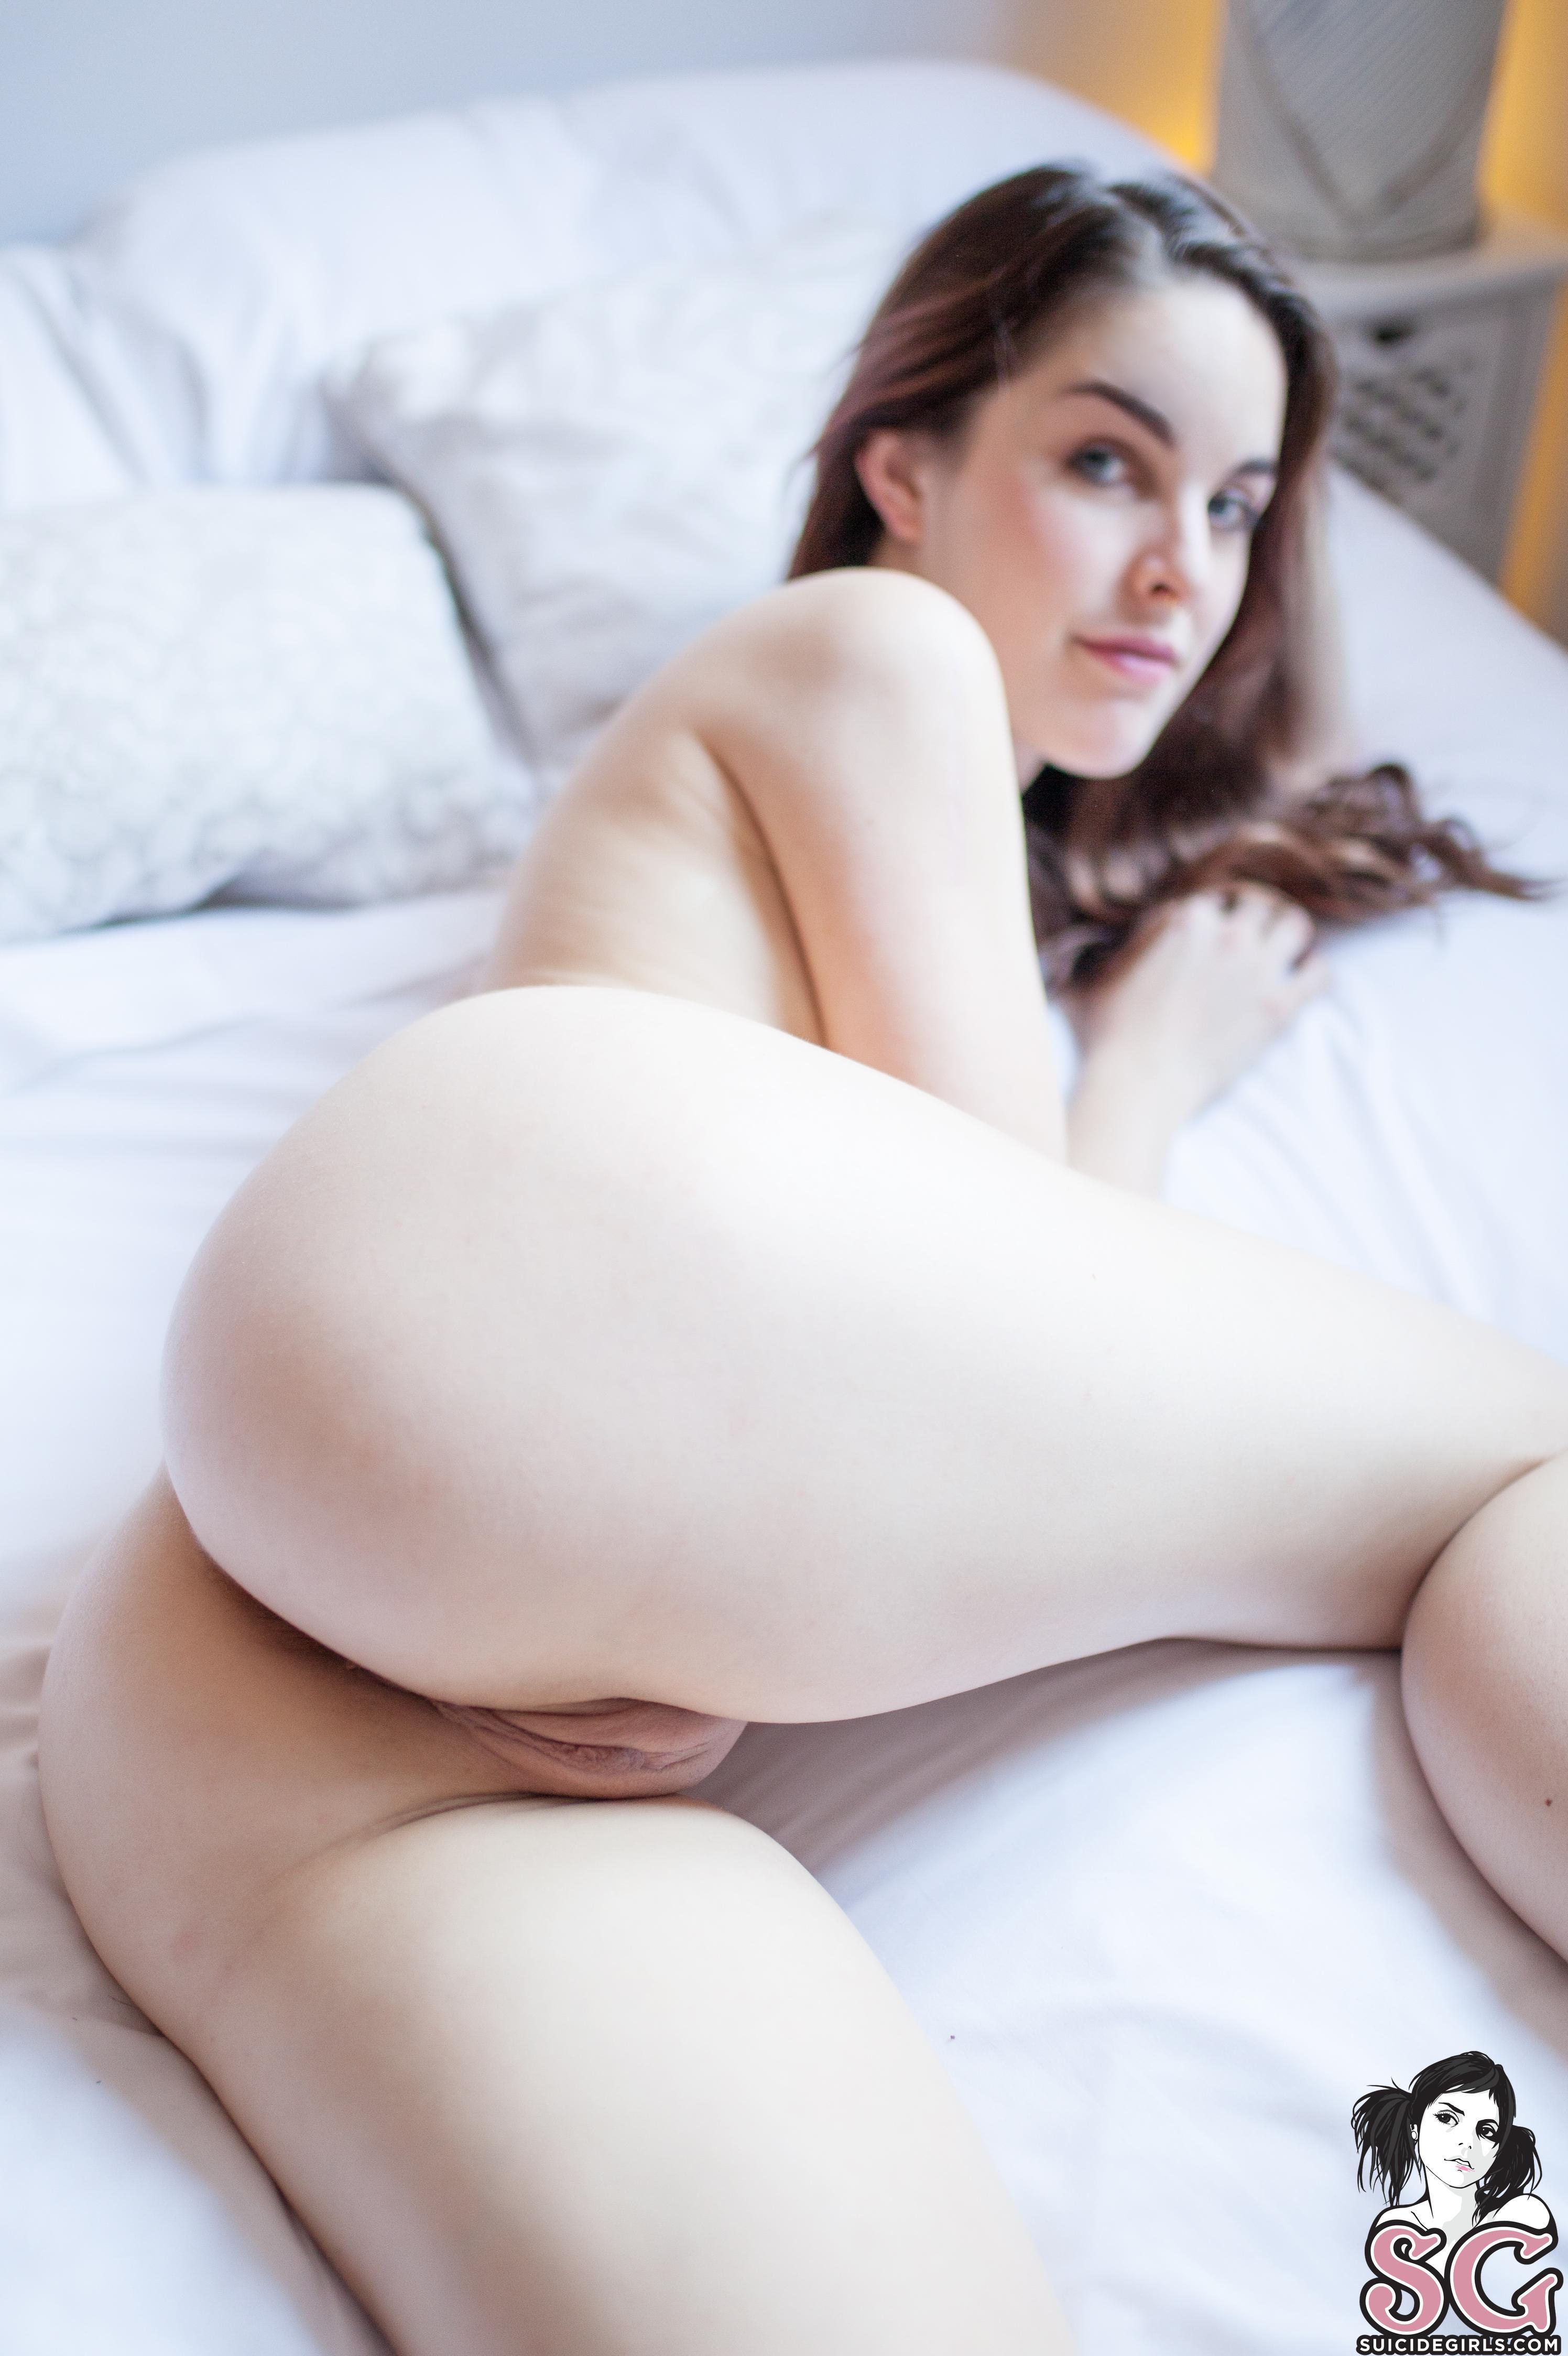 Amarna Miller Gif Porn Eat Pussy amarna porn pic - eporner